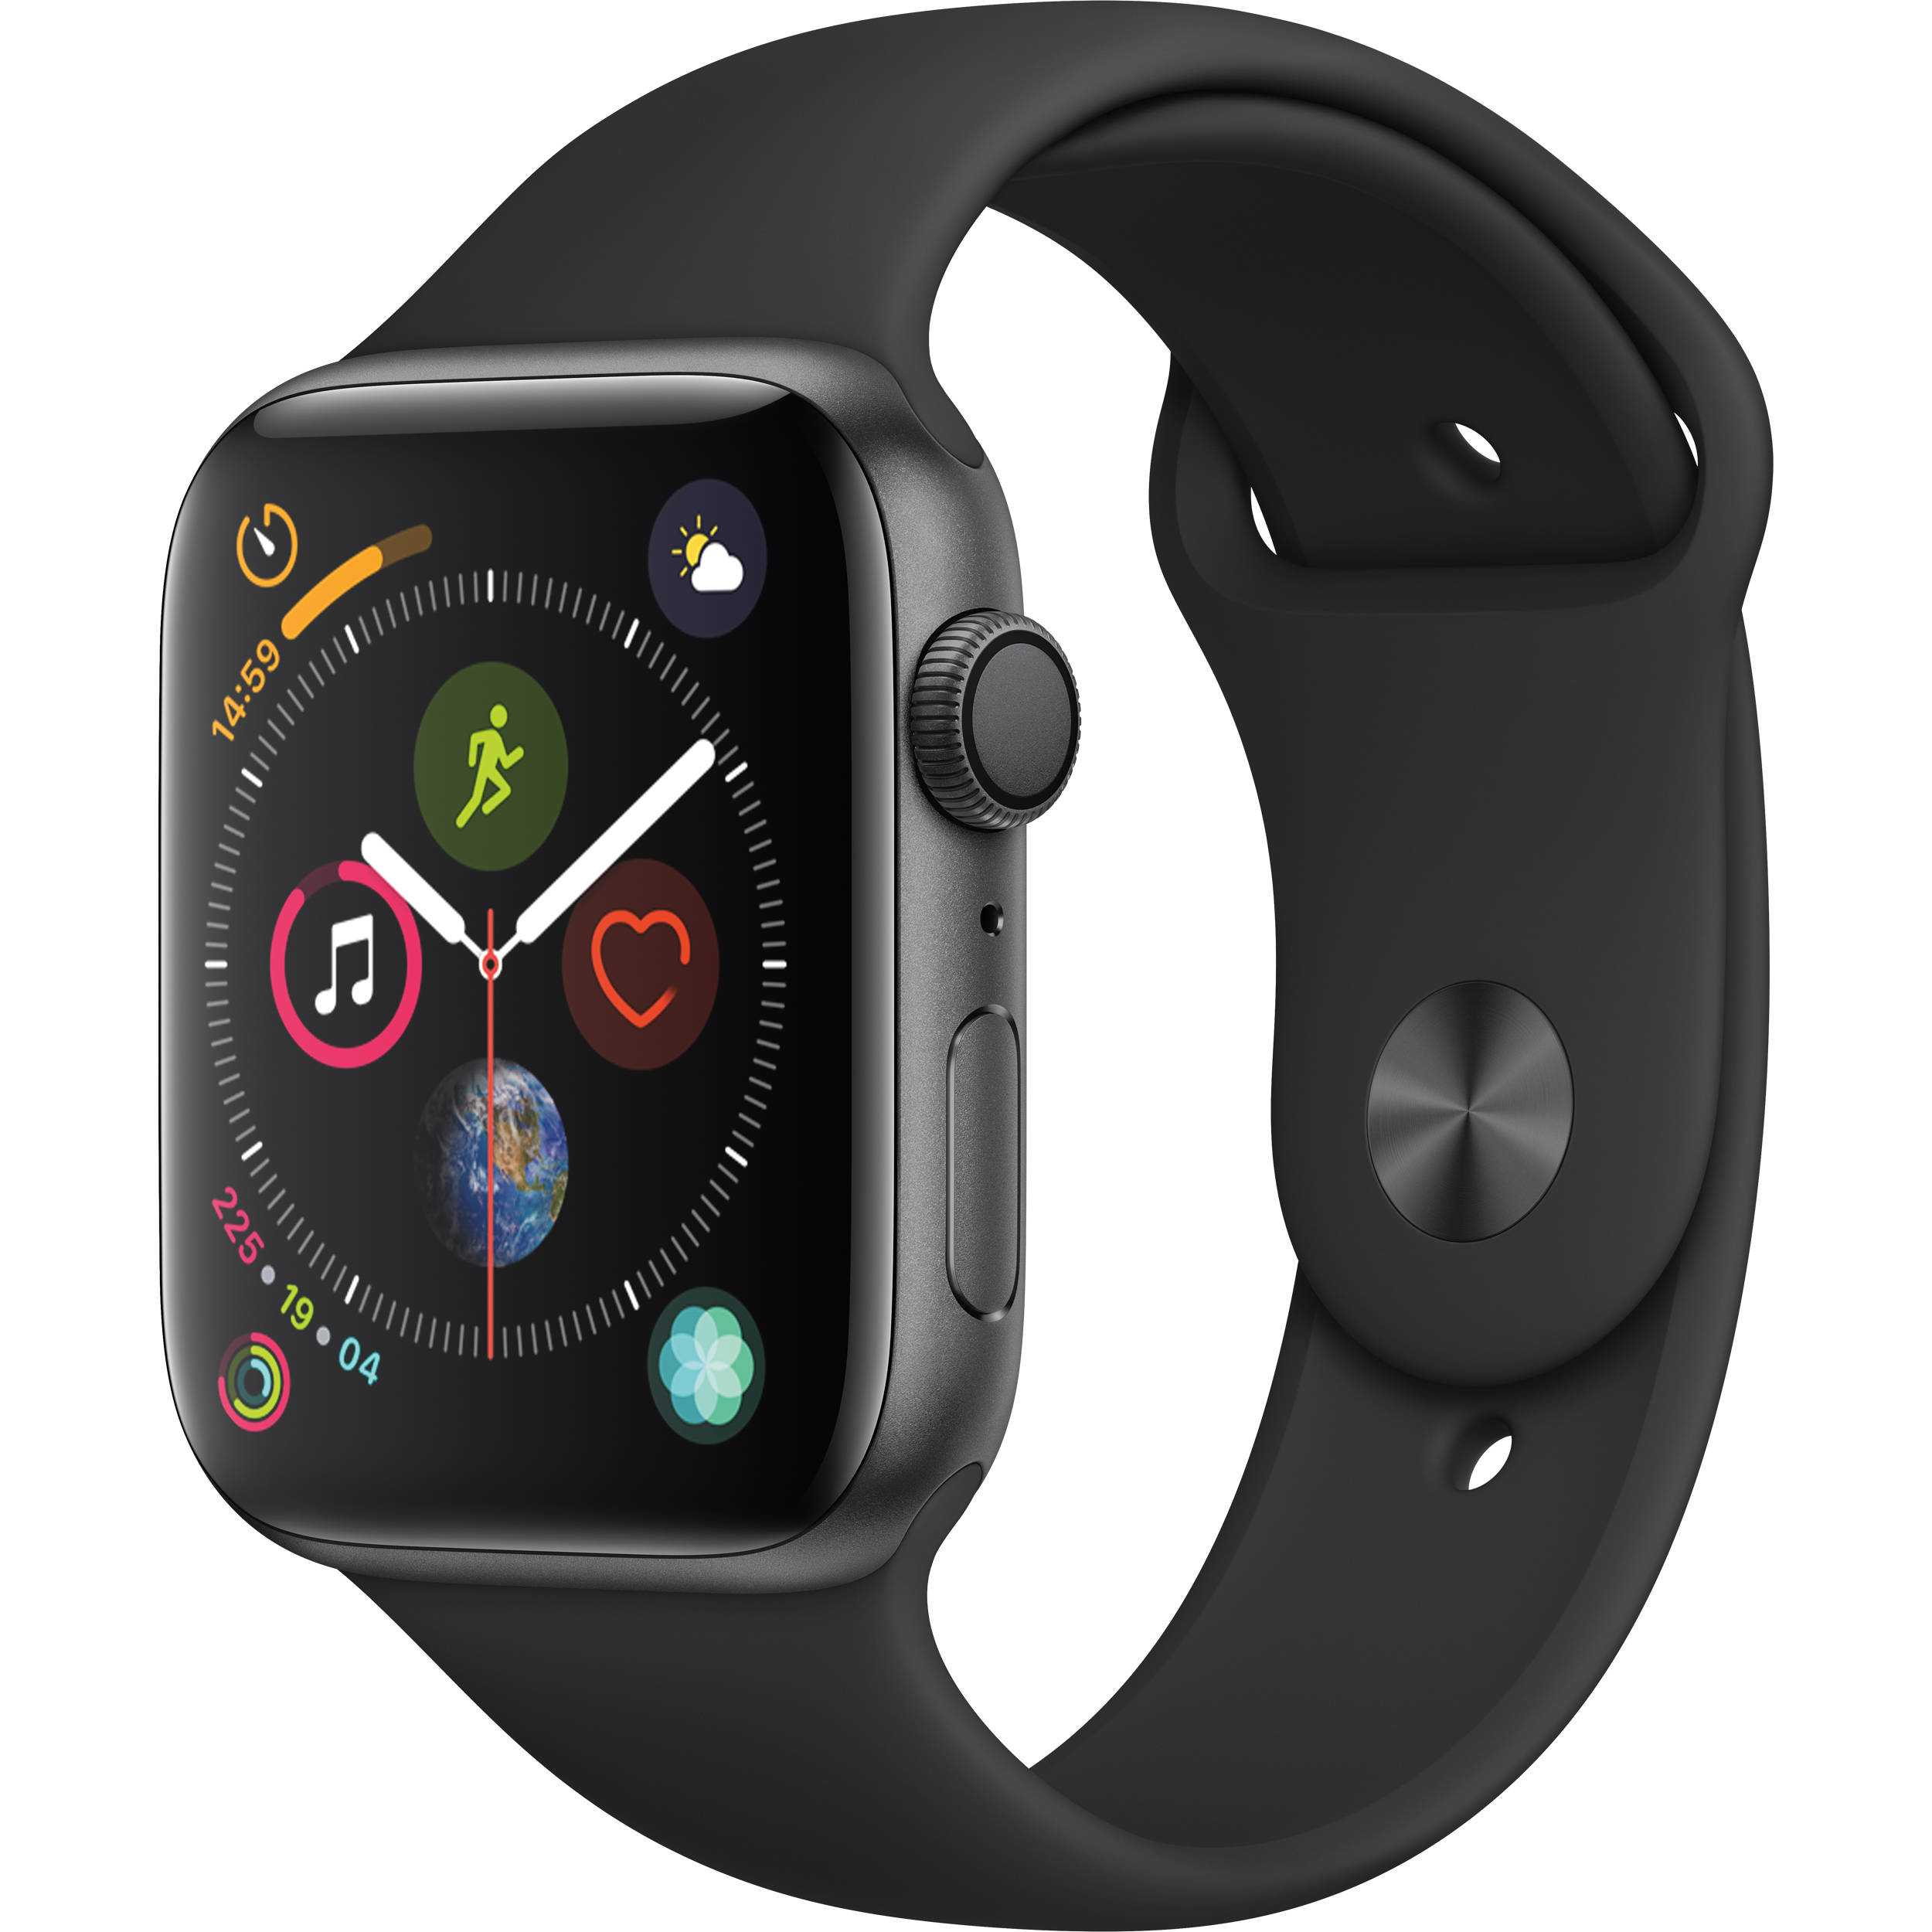 44mm apple watch band